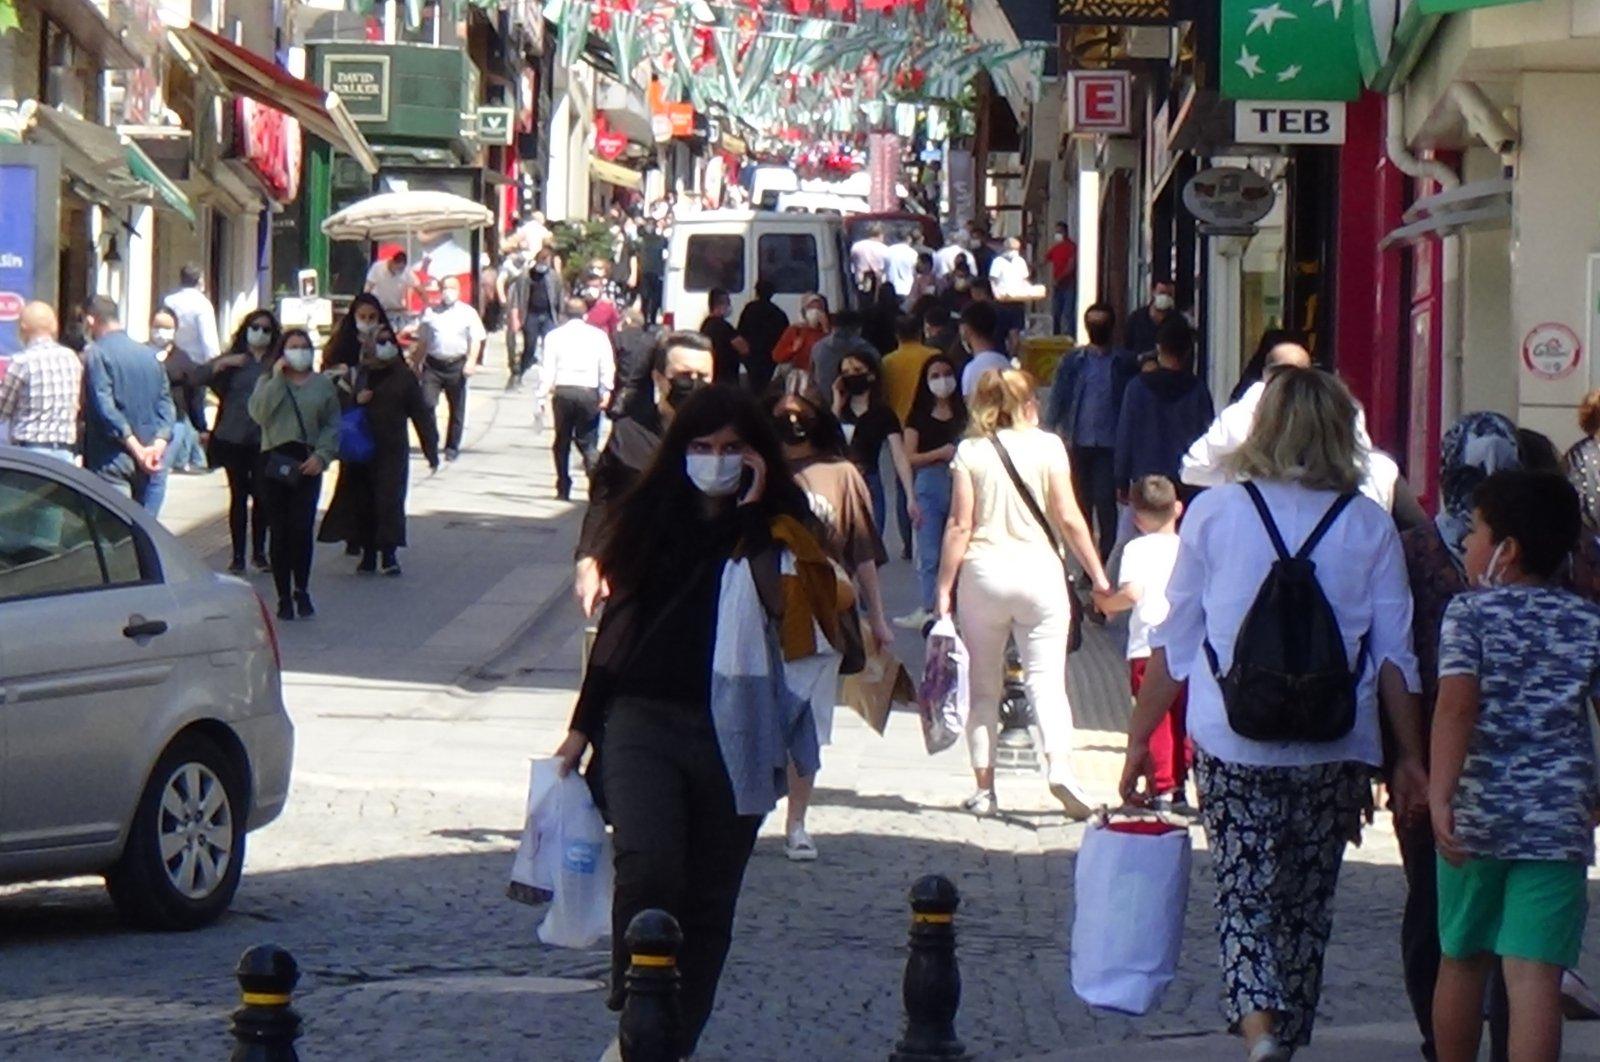 People wearing protective masks walk on a street in Giresun, northern Turkey, May 26, 2021. (İHA PHOTO)